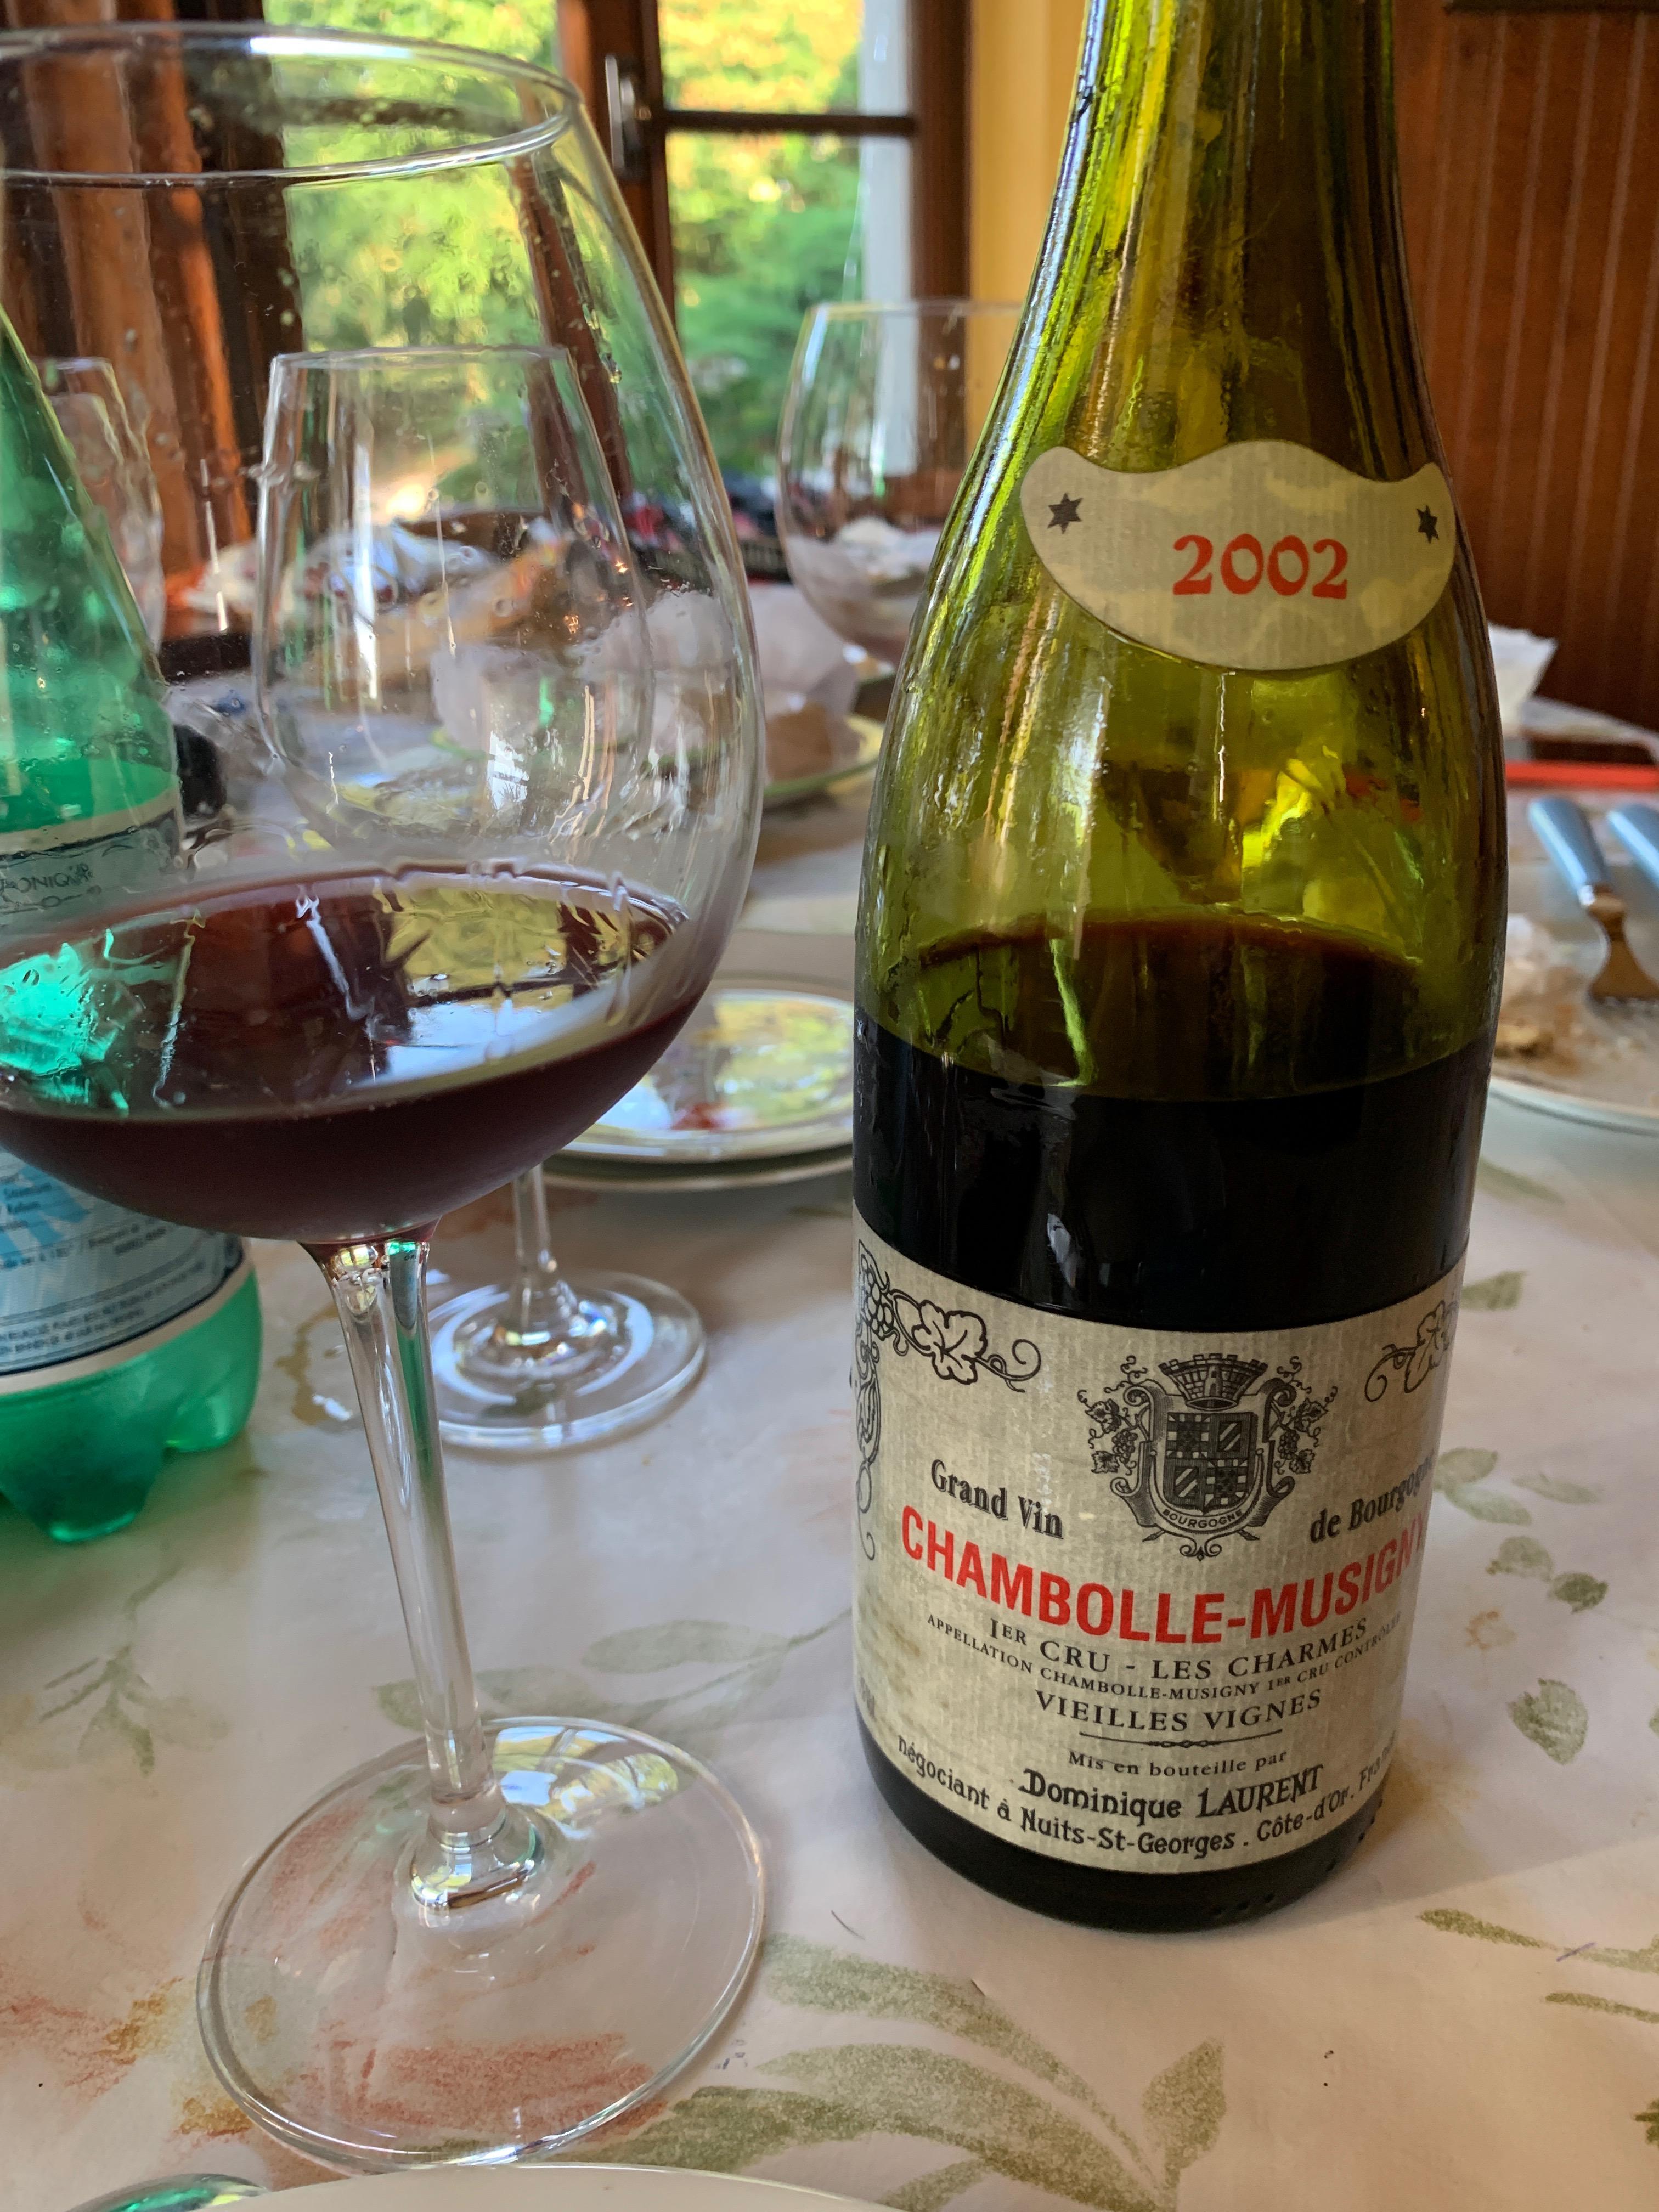 Chambolle-Musigny Premier Cru Les Charmes 2002 - Domaine Laurent